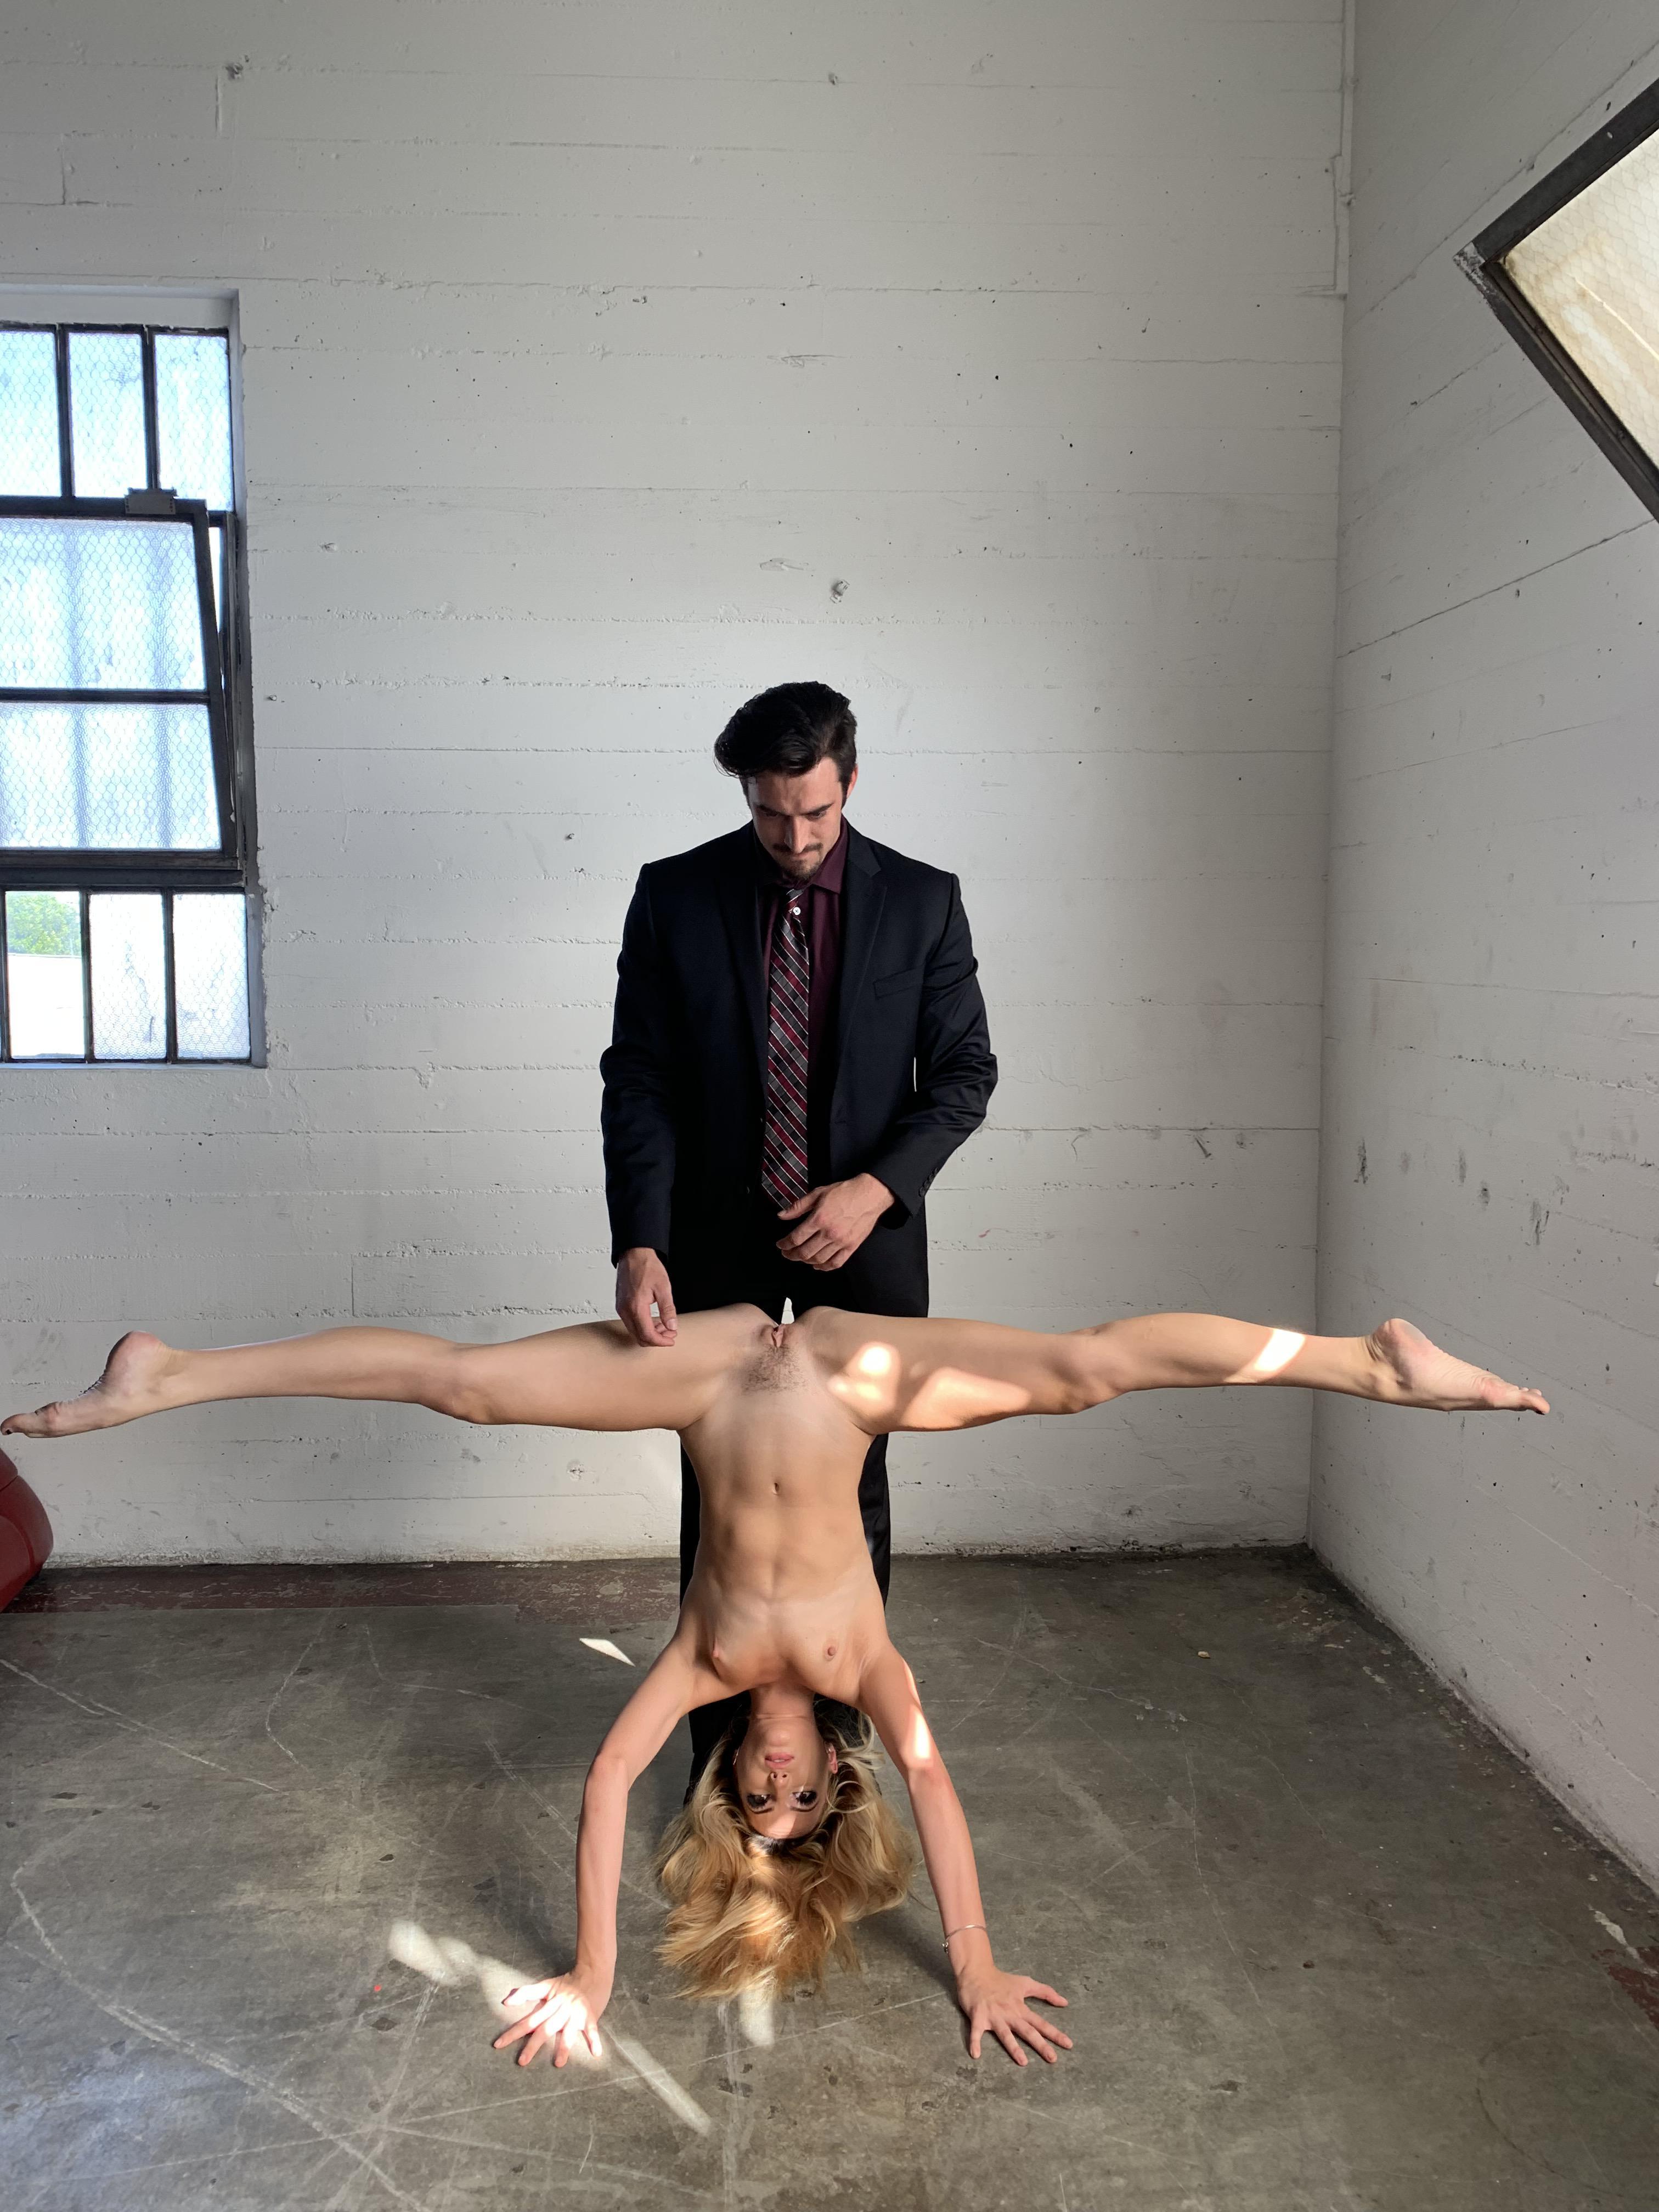 flexible-nude-girls-gymnast-splits-fetish-mix-vol2-75